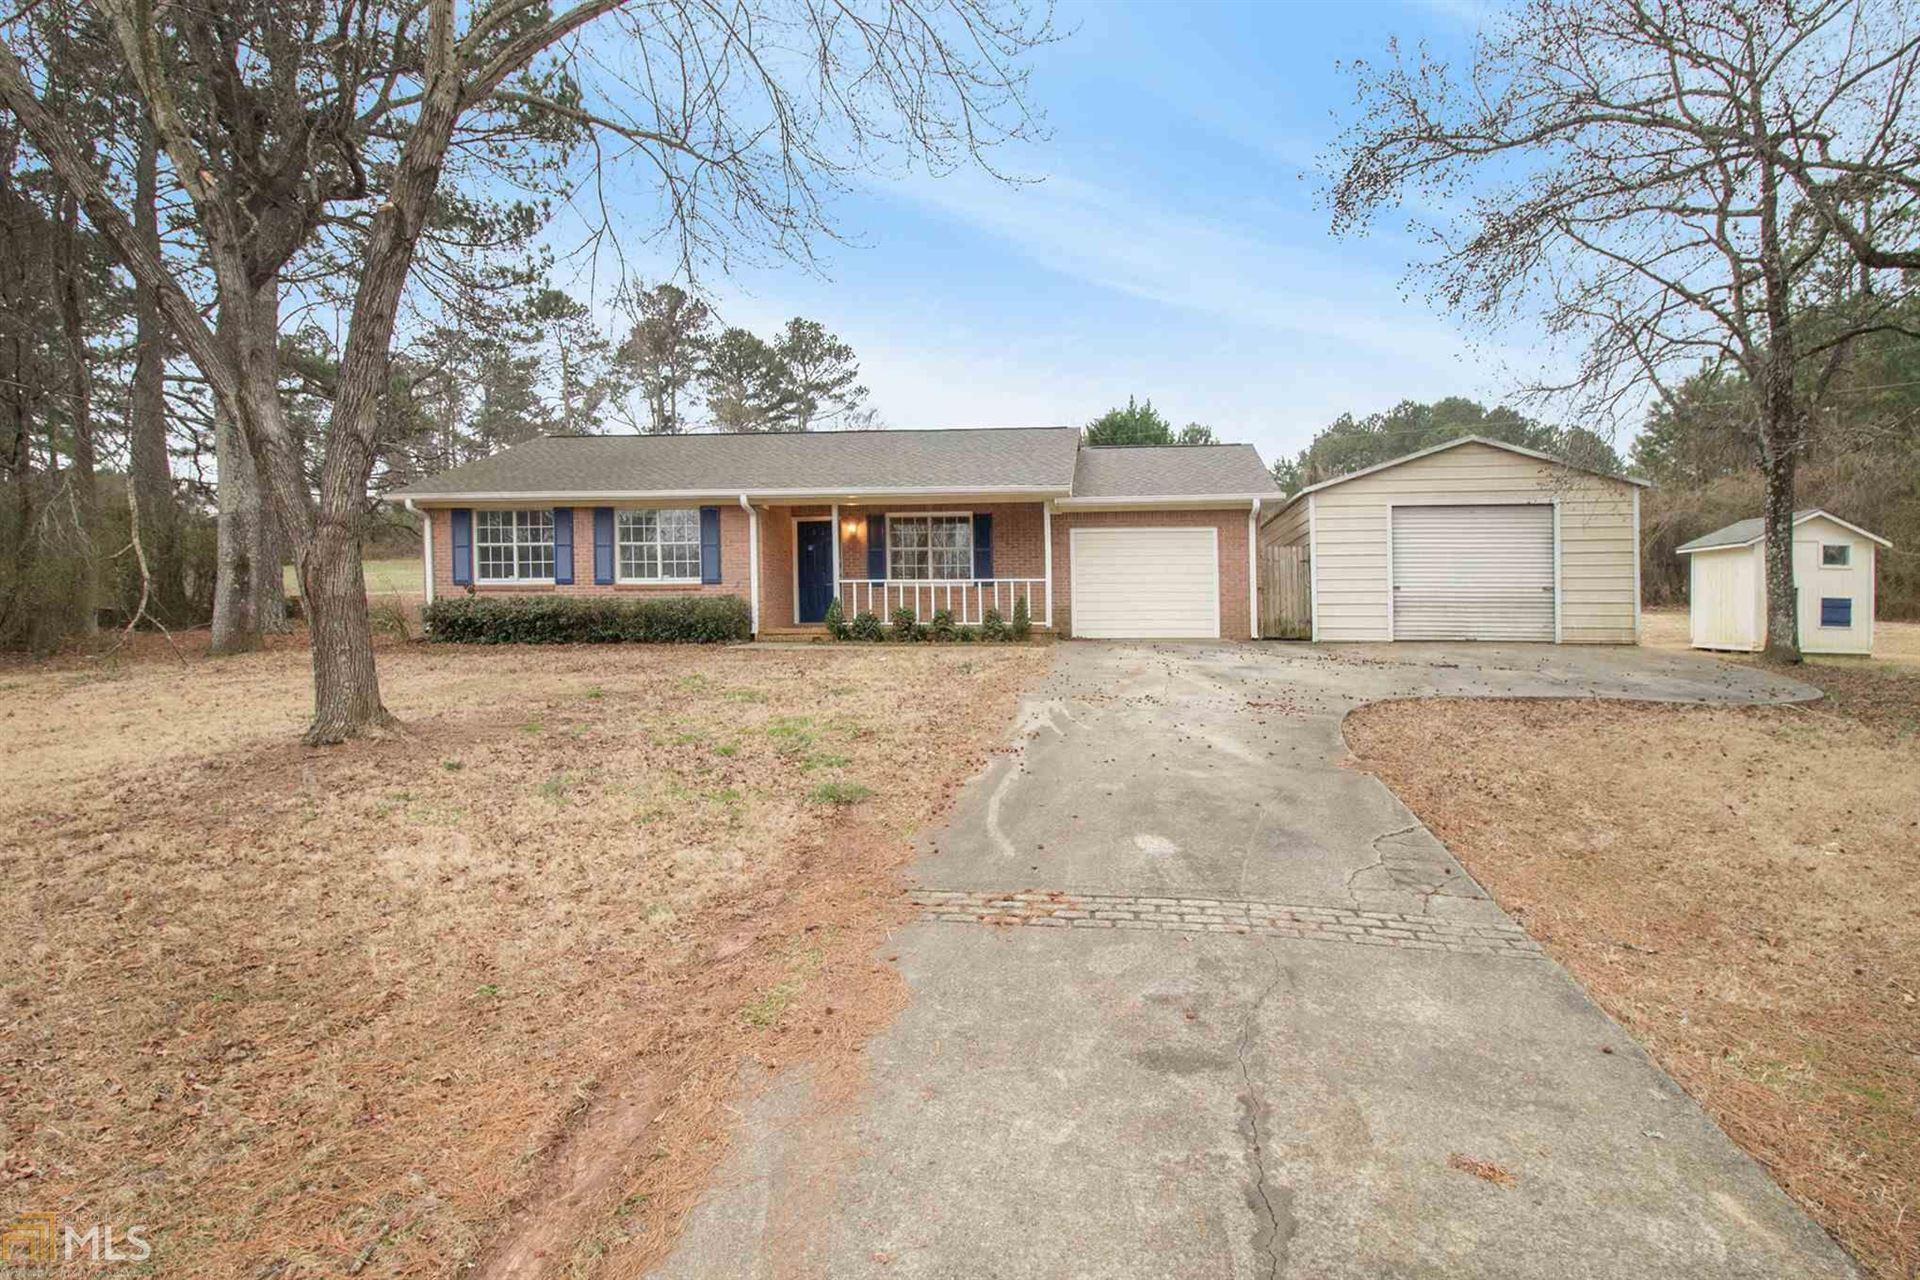 70 Arnold Rd, Hampton, GA 30228 - MLS#: 8911900